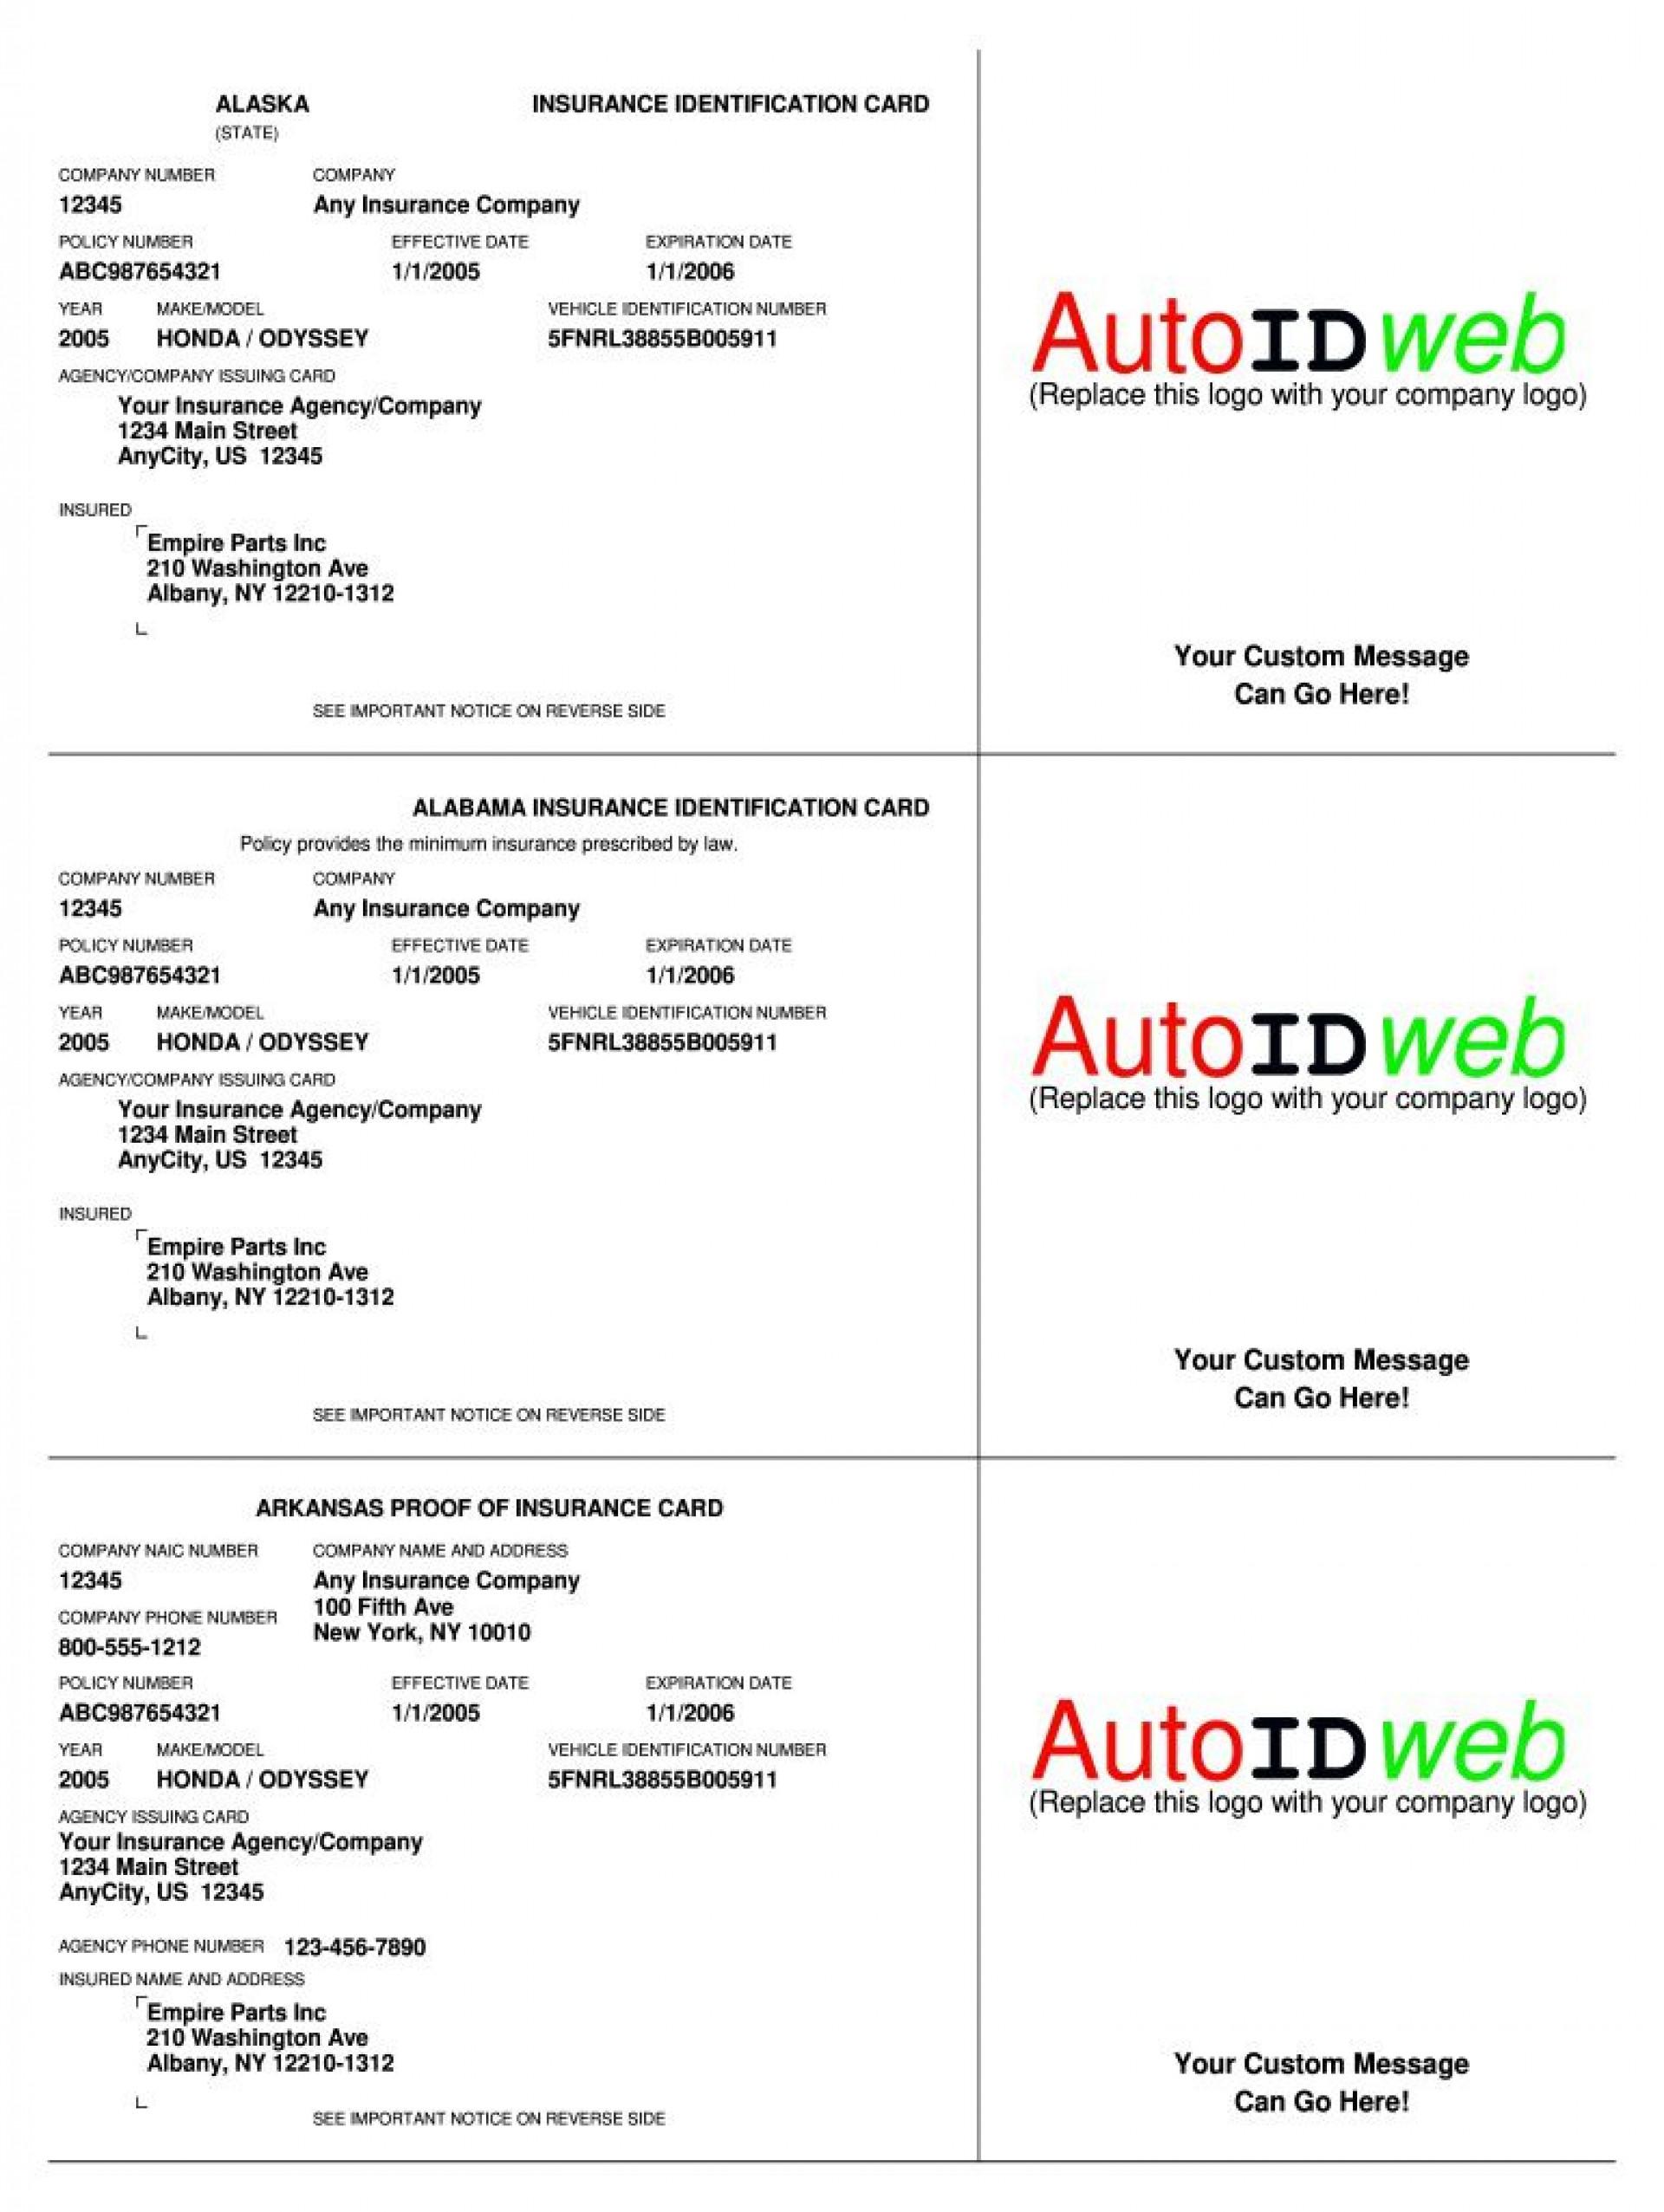 003 Singular Auto Insurance Card Template Pdf High Definition  Car Fake Geico Filler1920